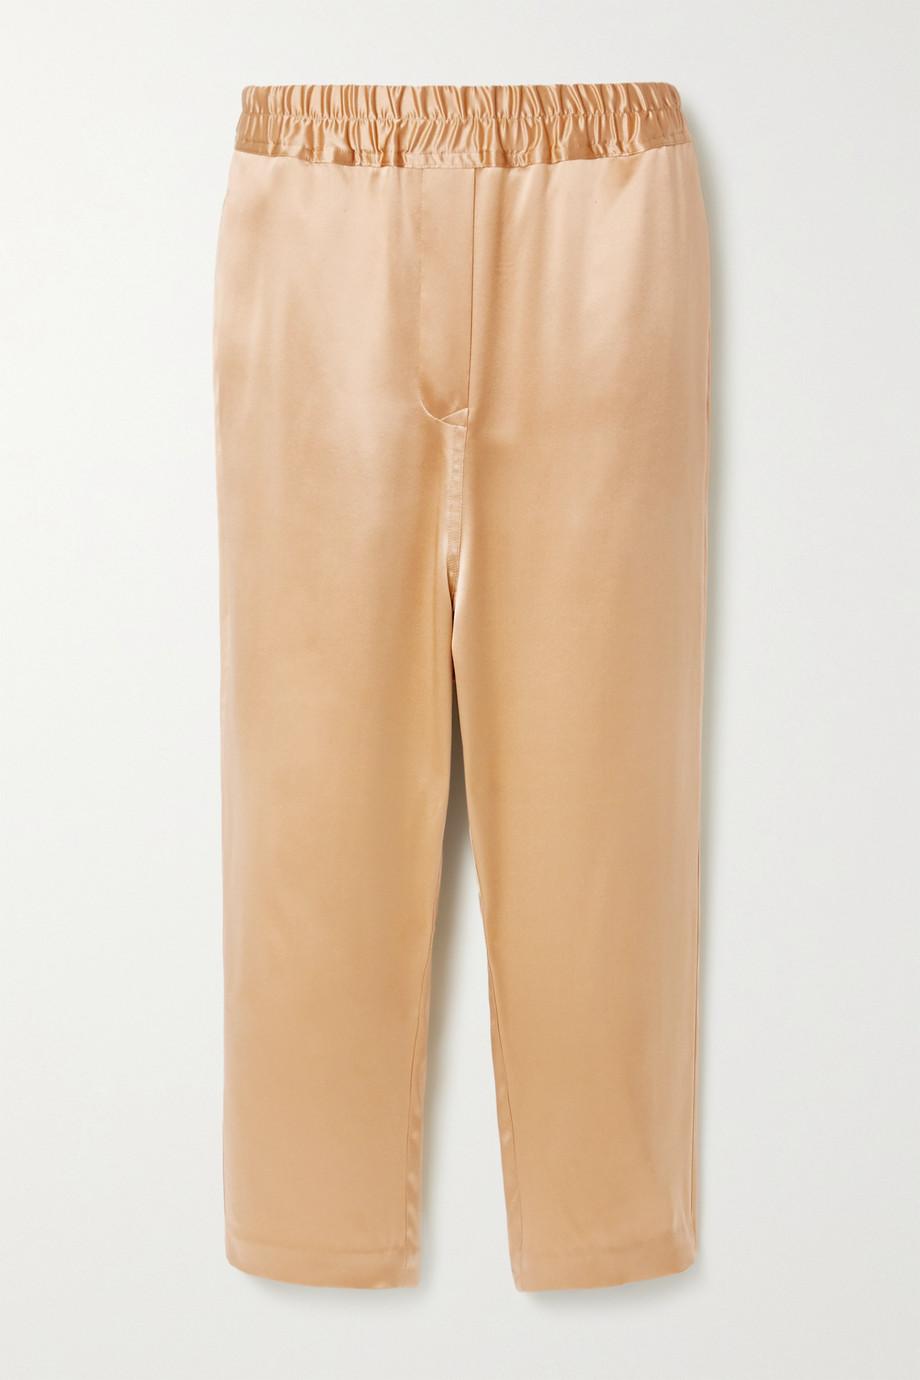 Nili Lotan Safi silk-satin track pants